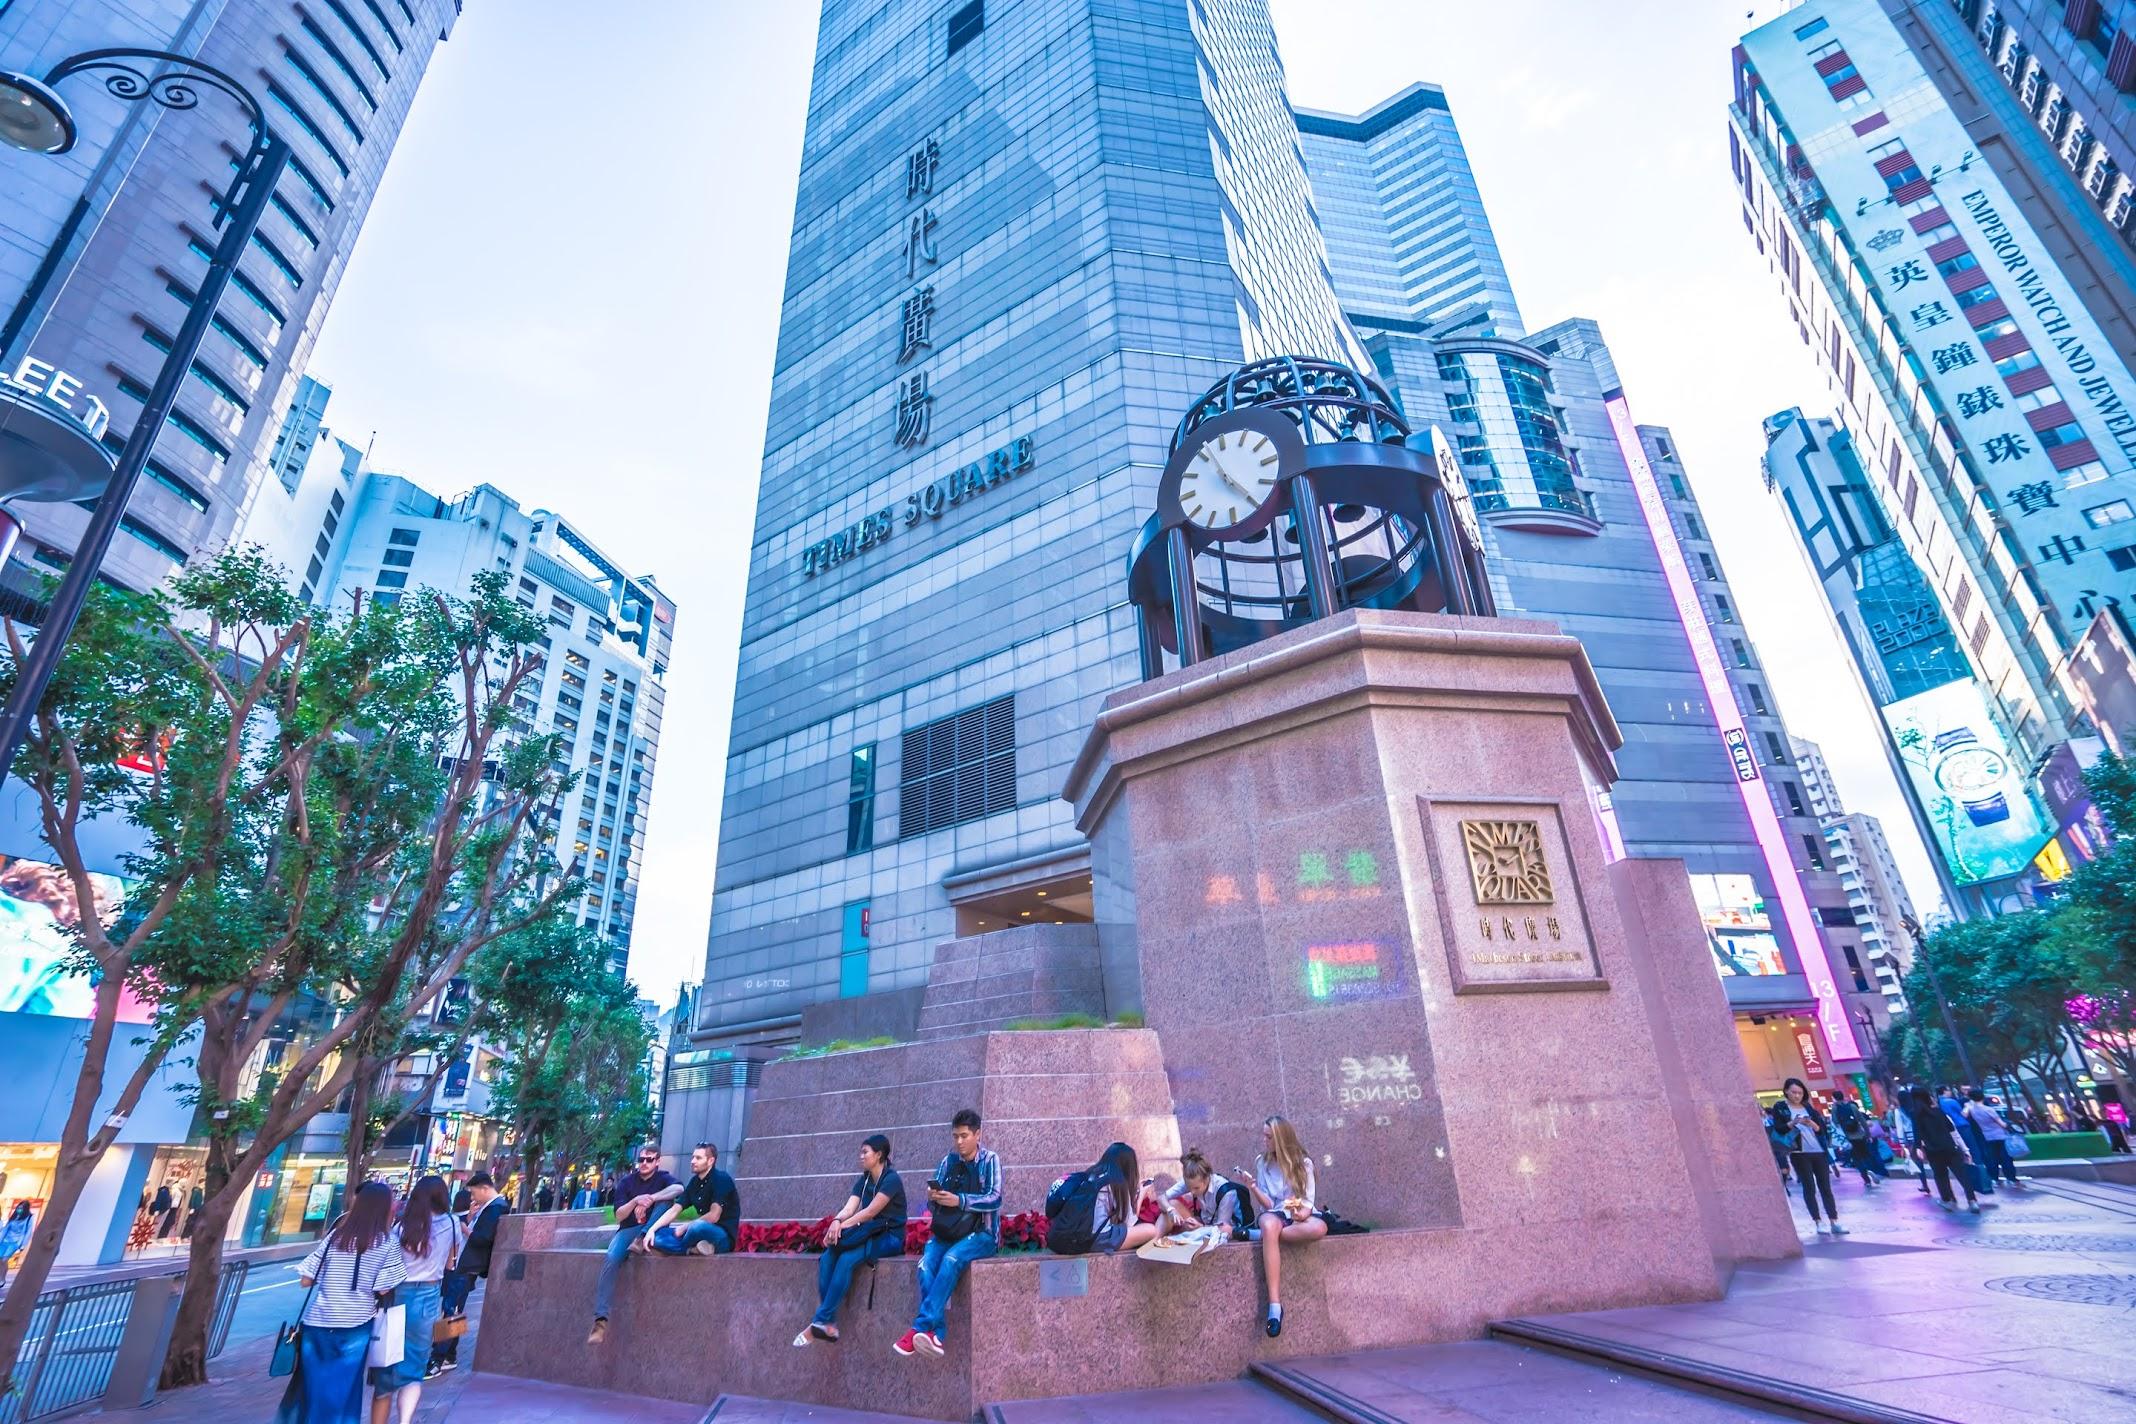 香港 銅鑼湾 Times Square